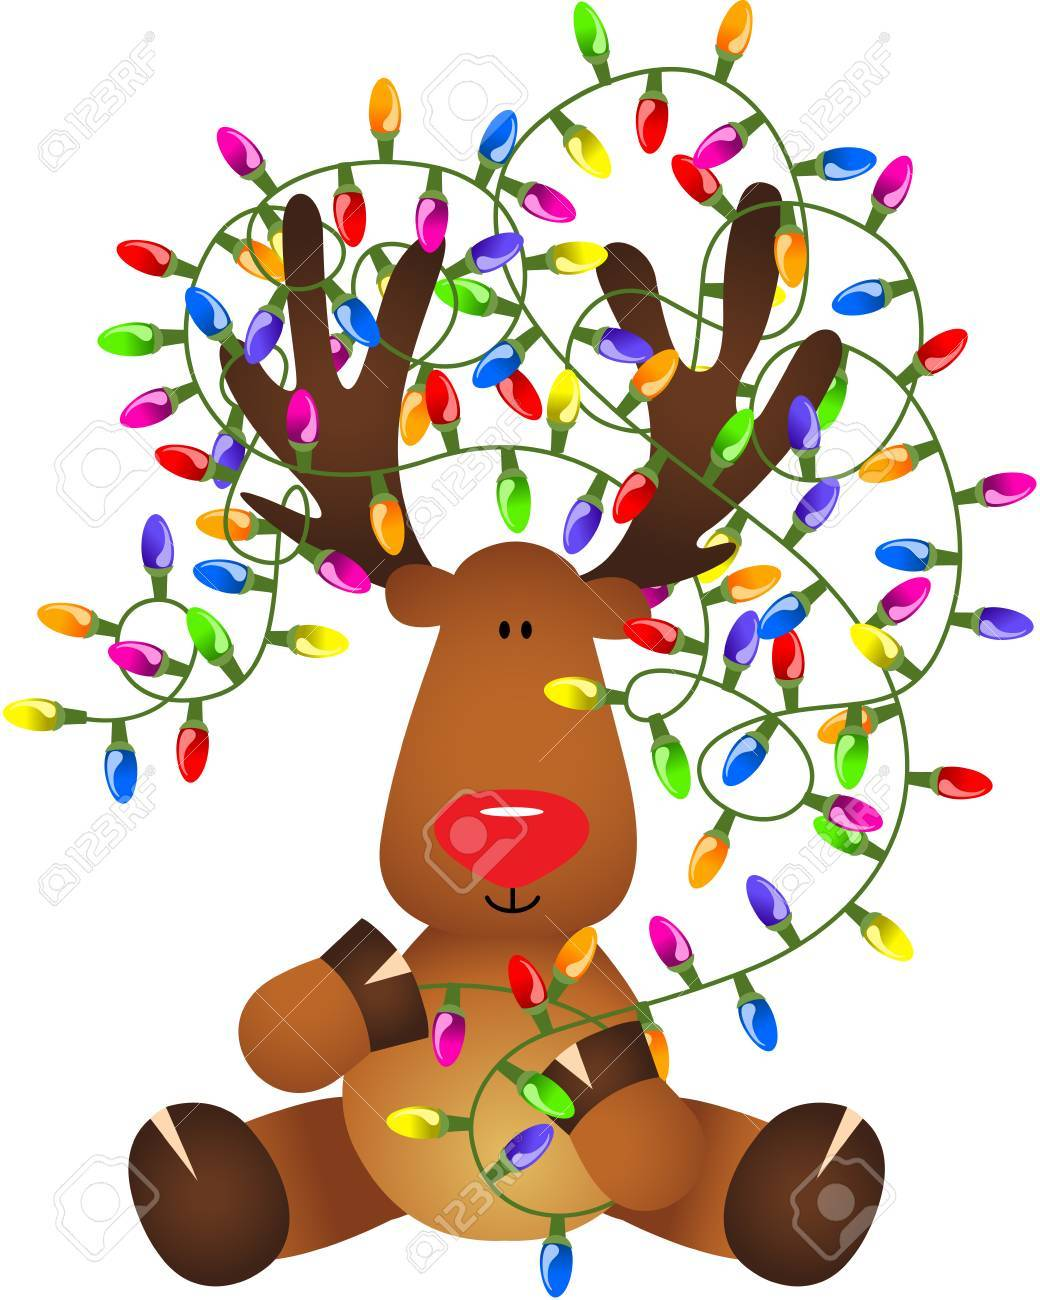 Cute reindeer with Christmas lights.